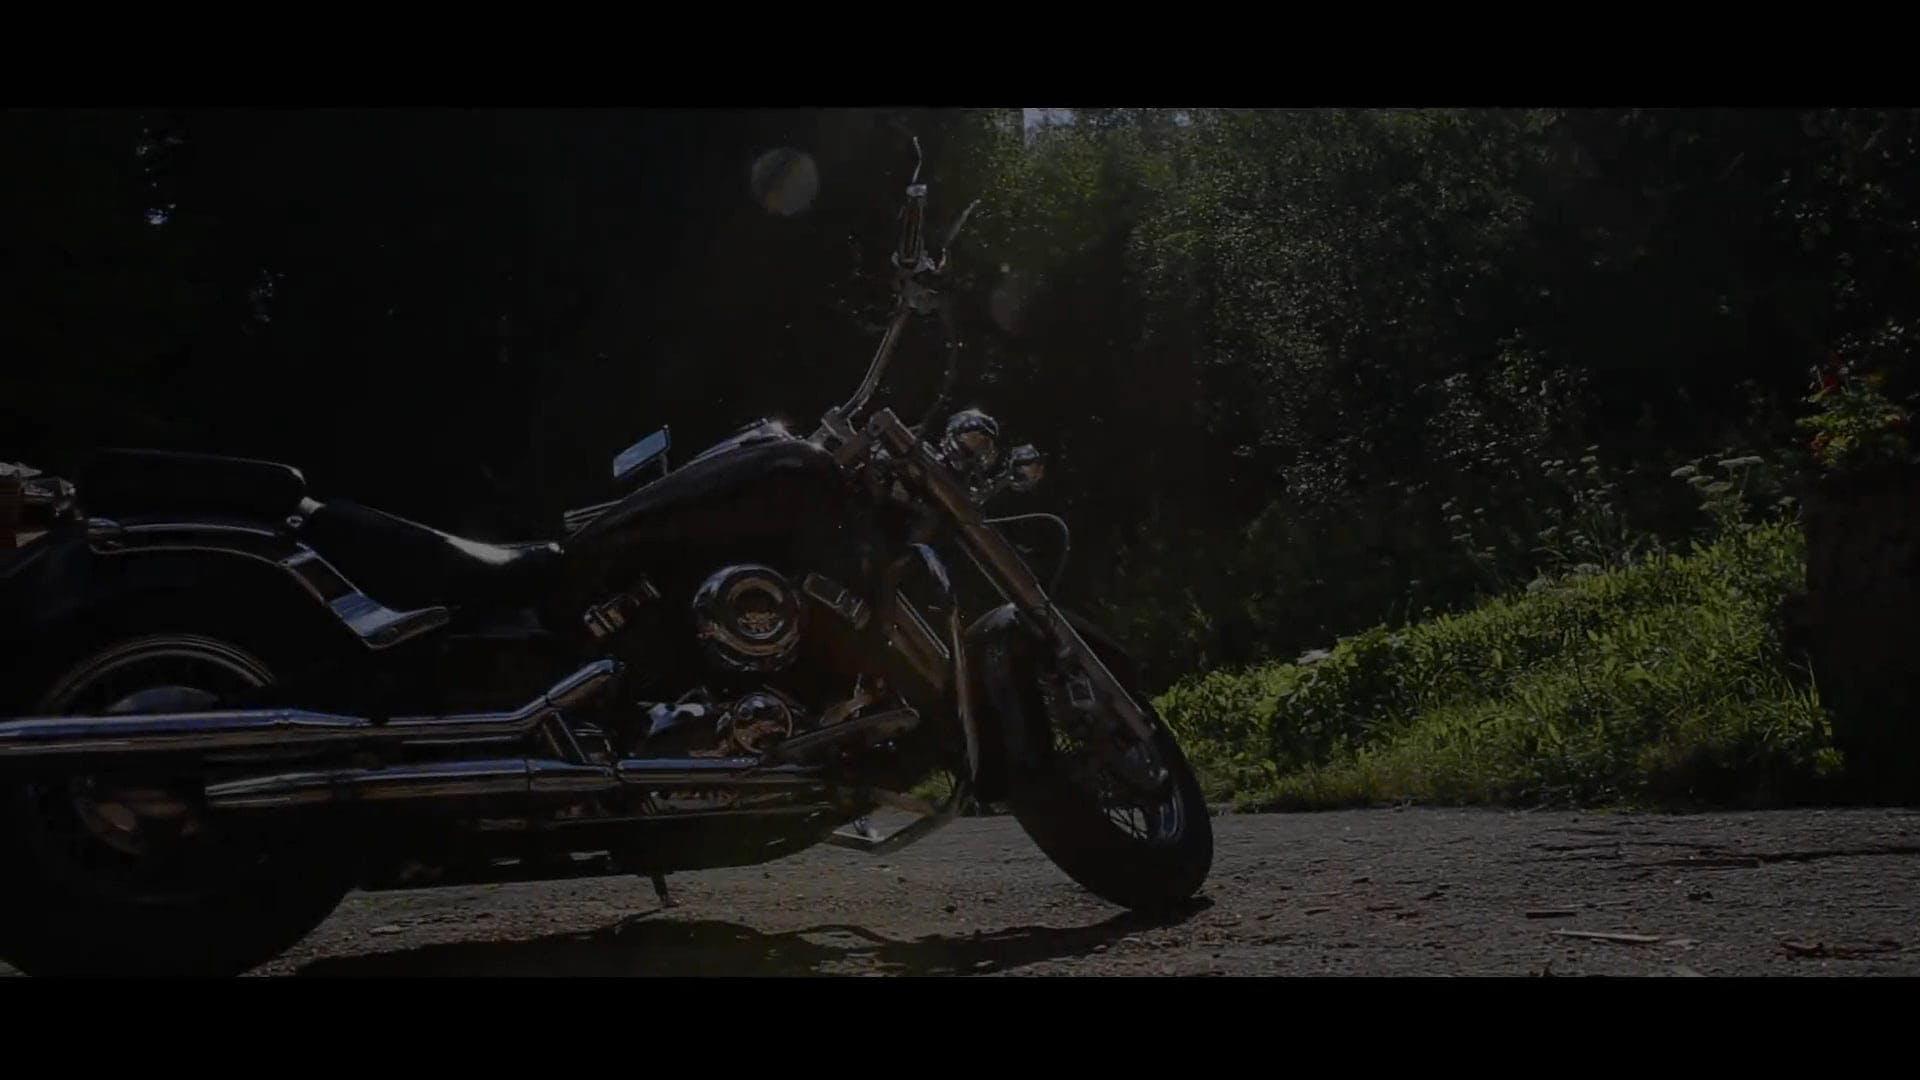 Video Of Motorcycle